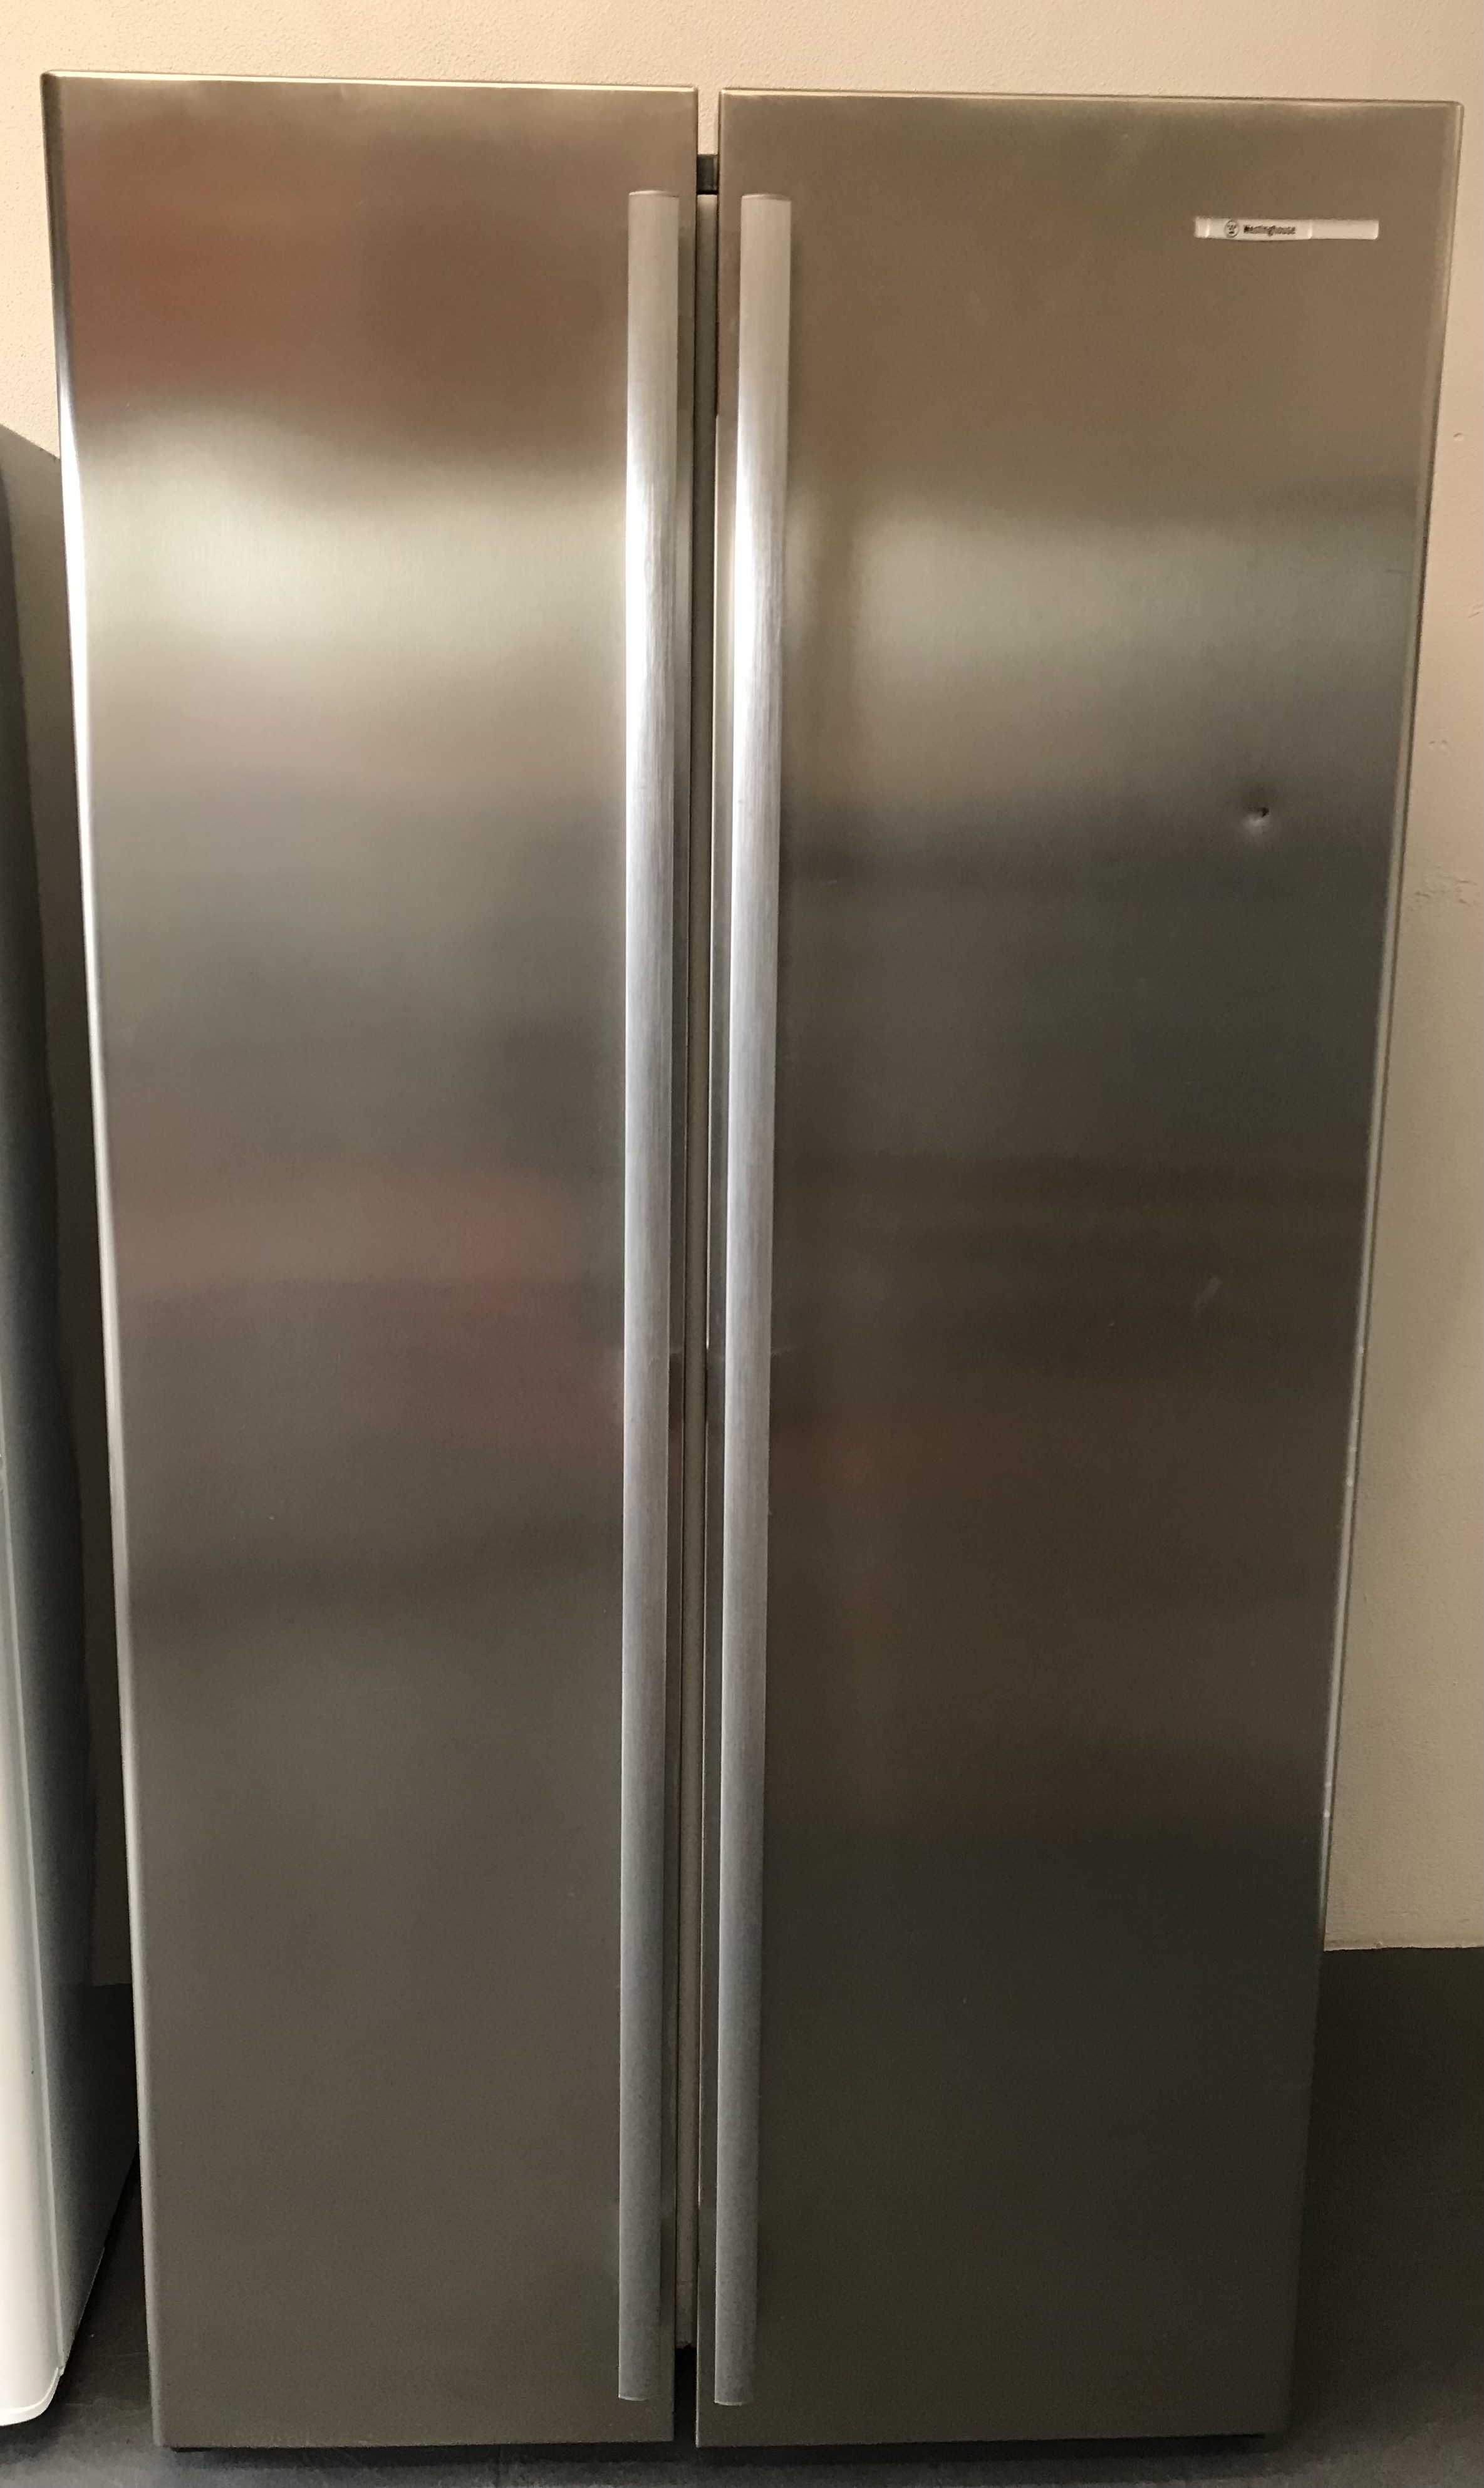 Stainless SxS Fridge/Freezer